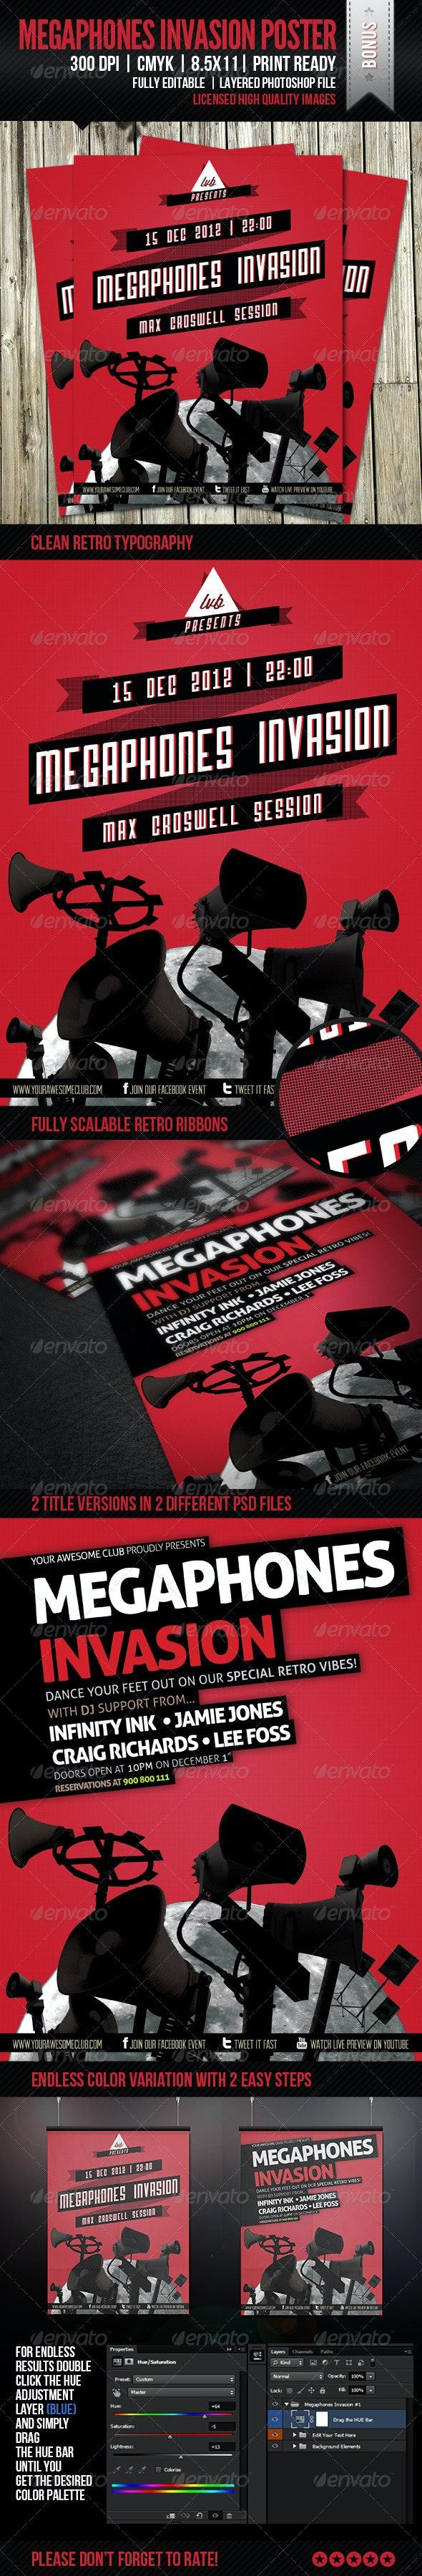 Megaphones Invasion Poster - Clubs & Parties Events